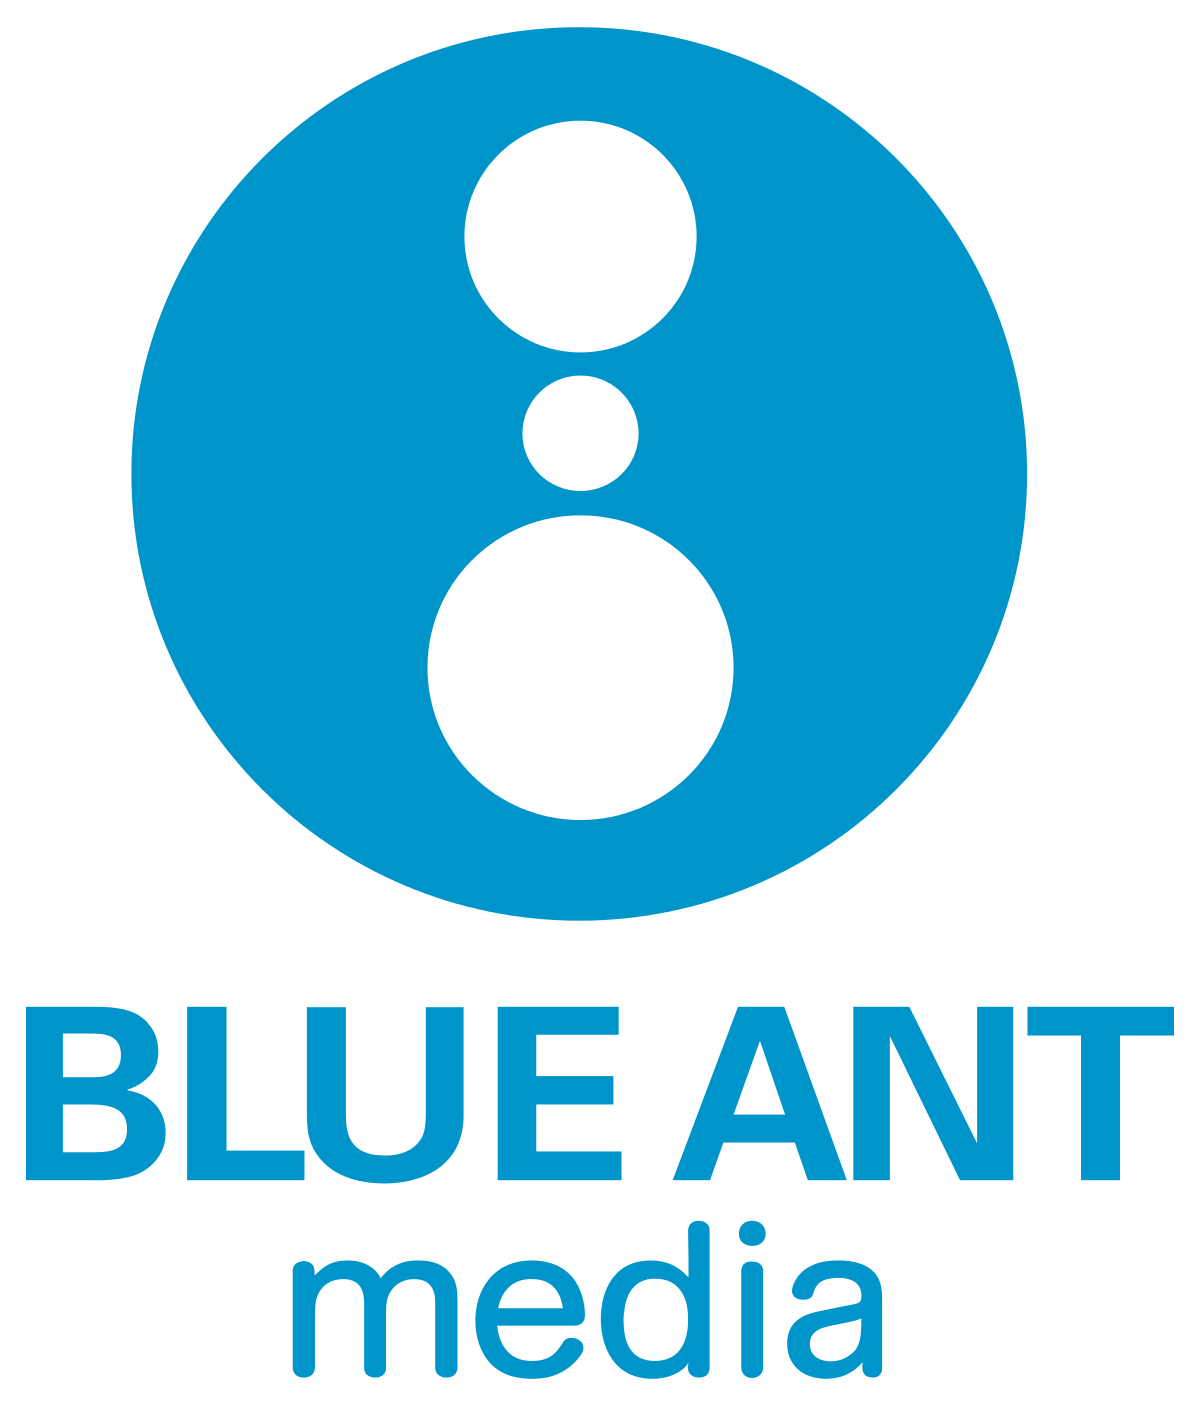 Blue Ant Media.png